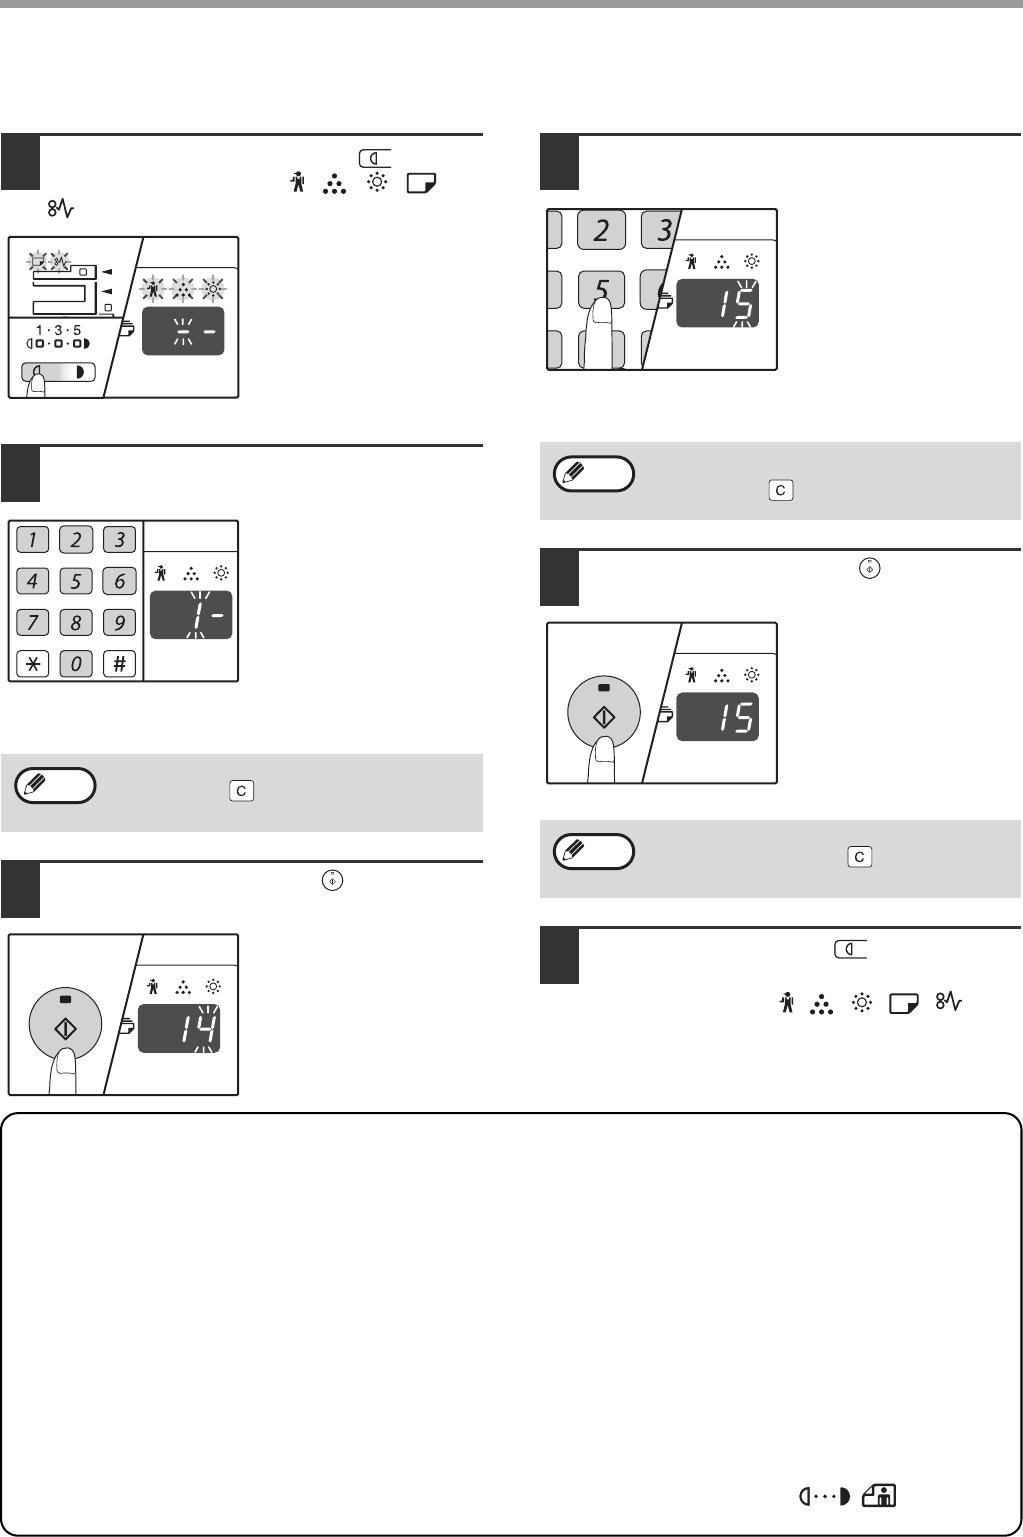 Sharp AR 5516N 5516N/5520N Operation Manual GB User To The